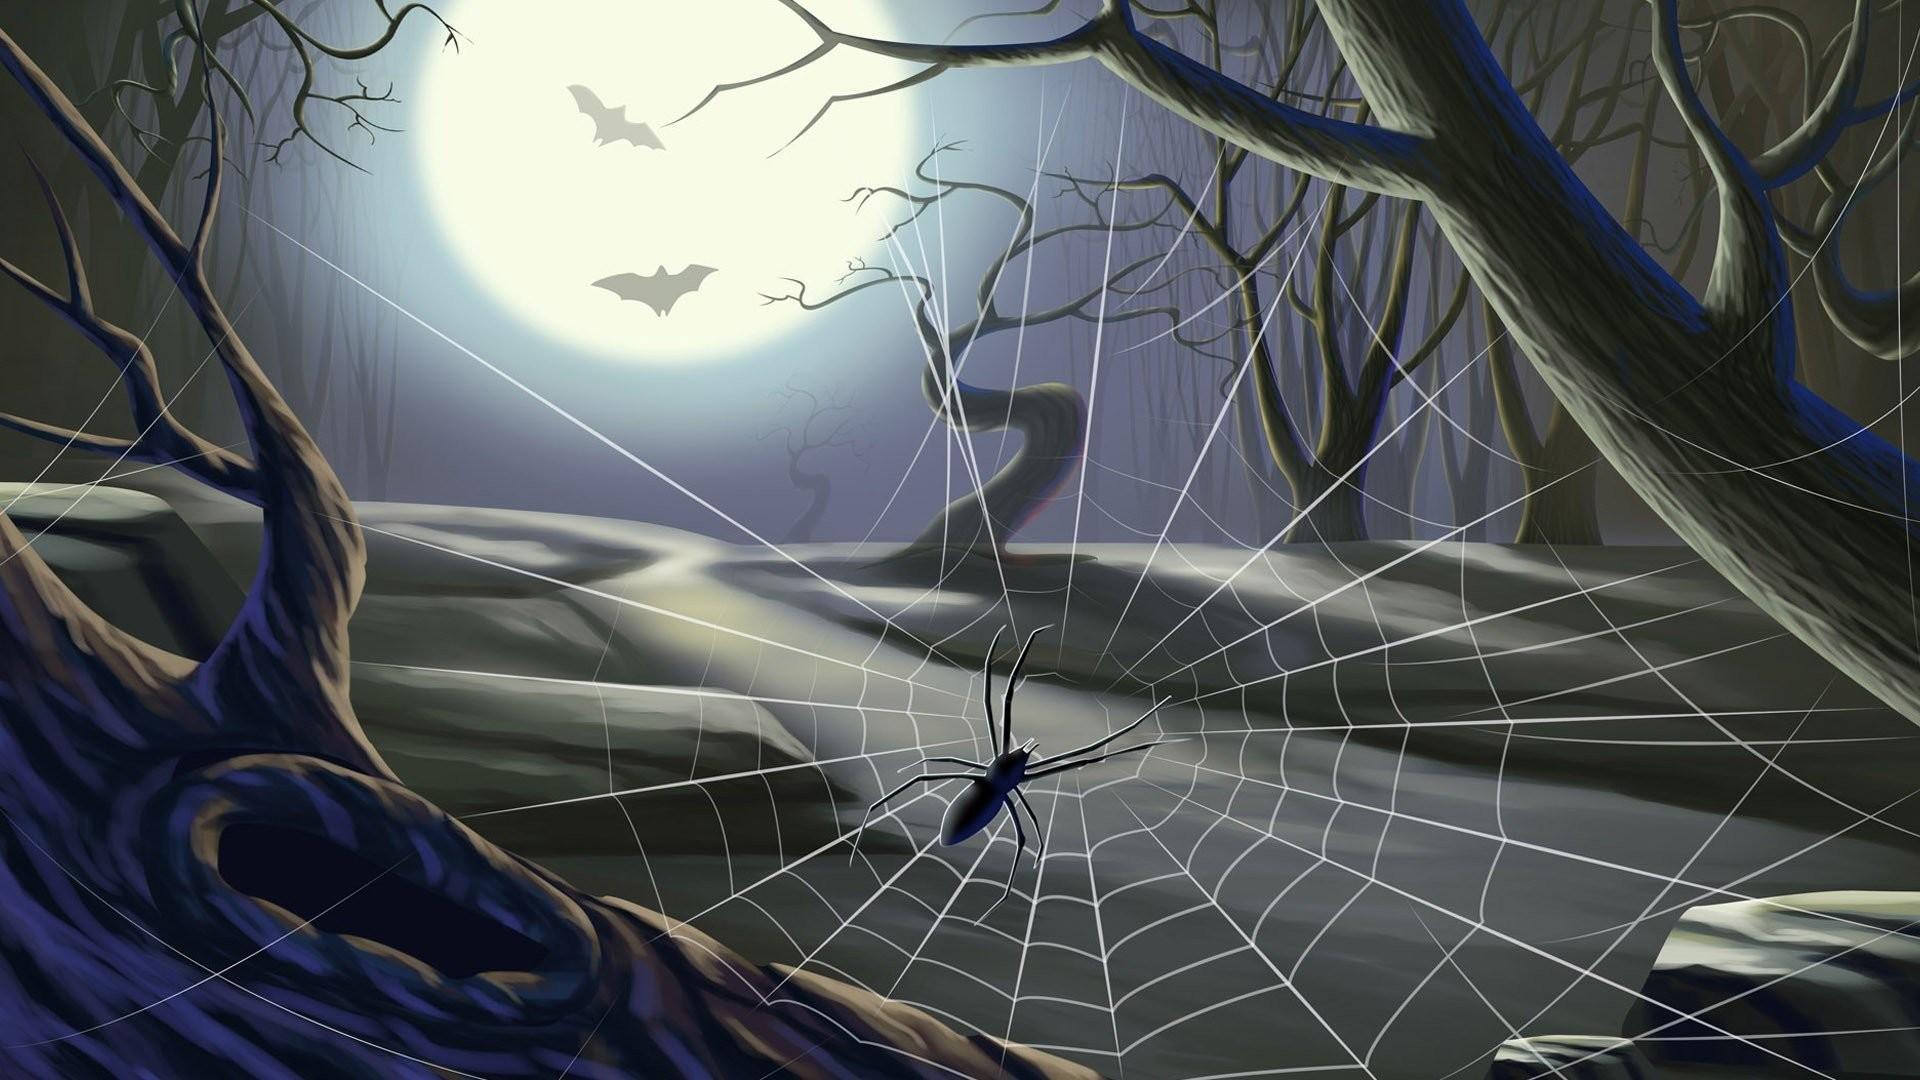 Halloween Spider Web Wallpaper 751865 – WallDevil. Halloween Spider Web  Wallpaper 751865 WallDevil